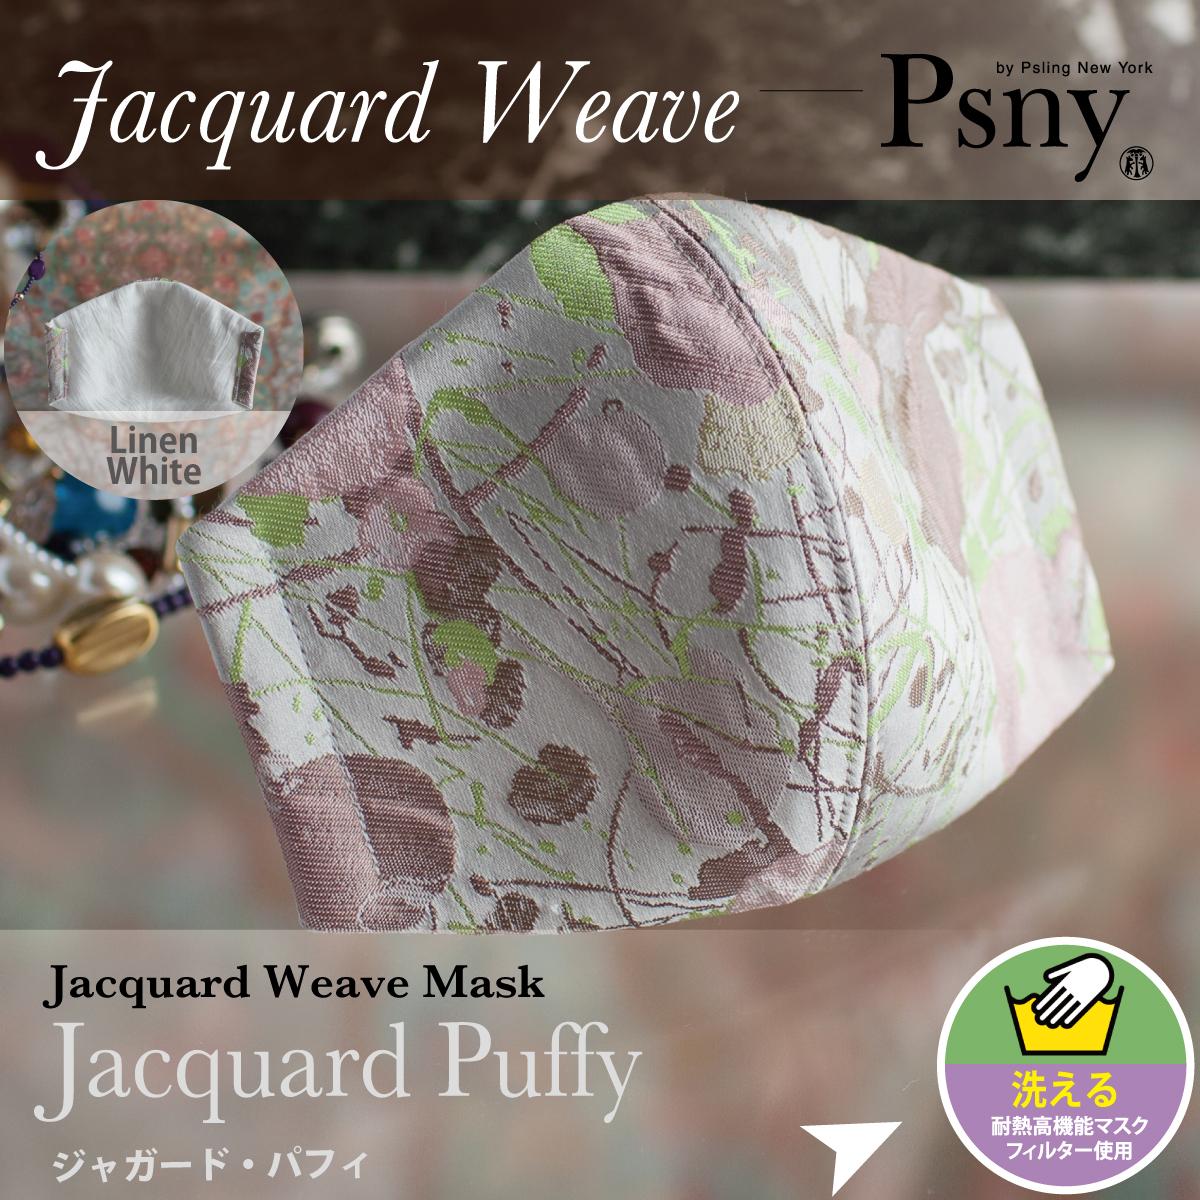 PSNY ジャガード・パフィー 花粉 黄砂 洗える不織布フィルター入り 立体 大人用 マスク 送料無料 FJ1